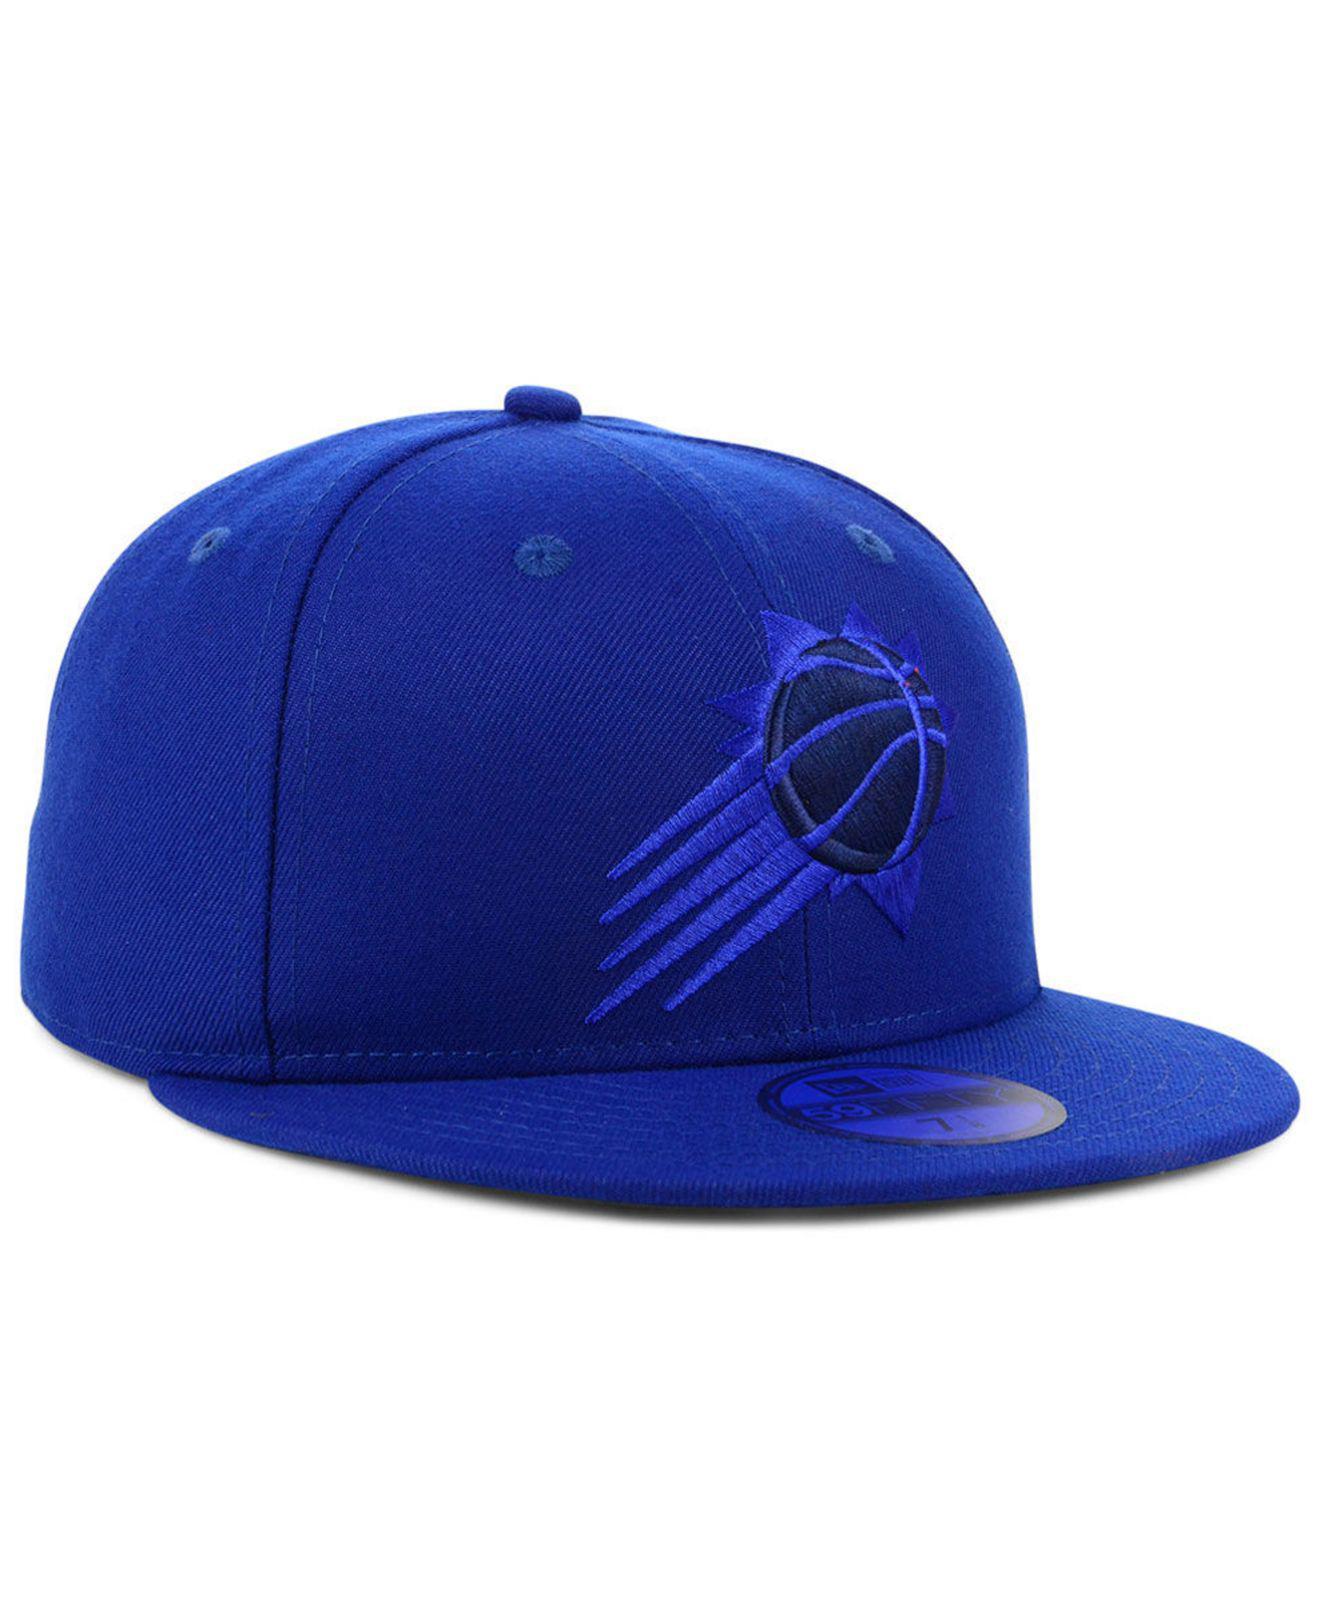 quality design fa234 1edb9 new arrivals new york knicks new era official team color 9forty adjustable  hat blue 633c9 18d04  switzerland lyst ktz phoenix suns color prism pack  59fifty ...